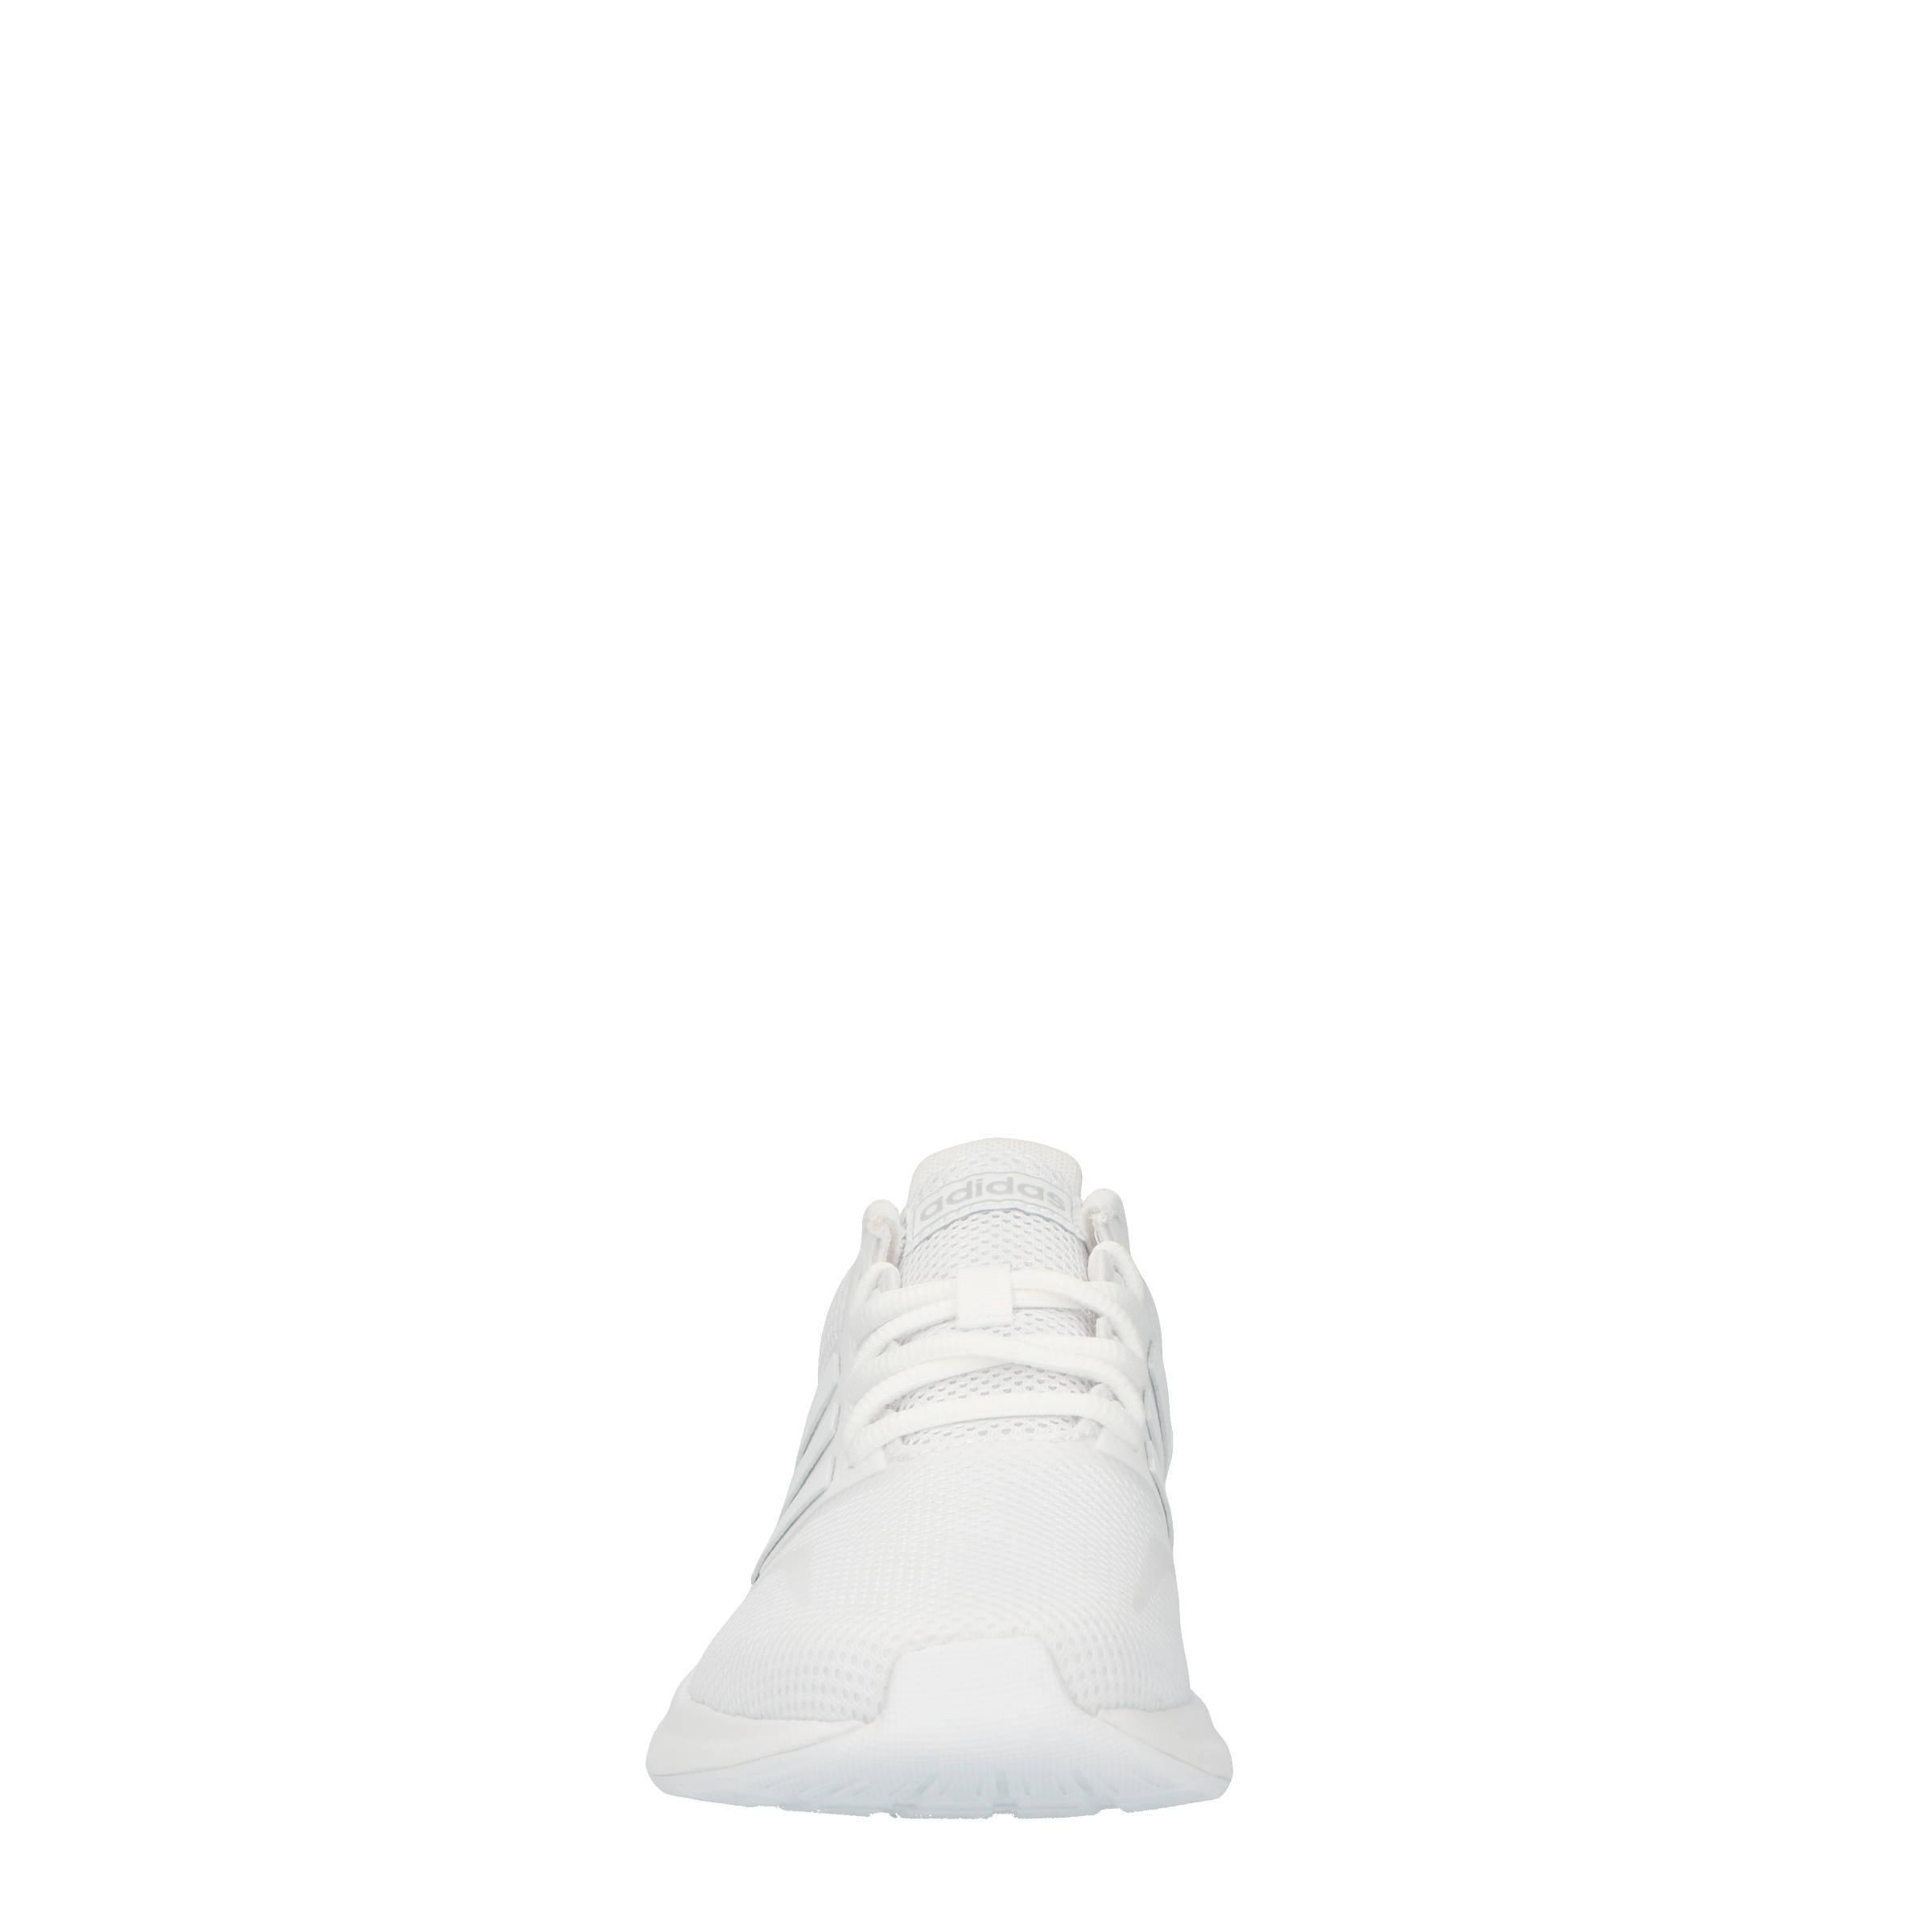 adidas Performance Runfalcon hardloopschoenen wit | wehkamp